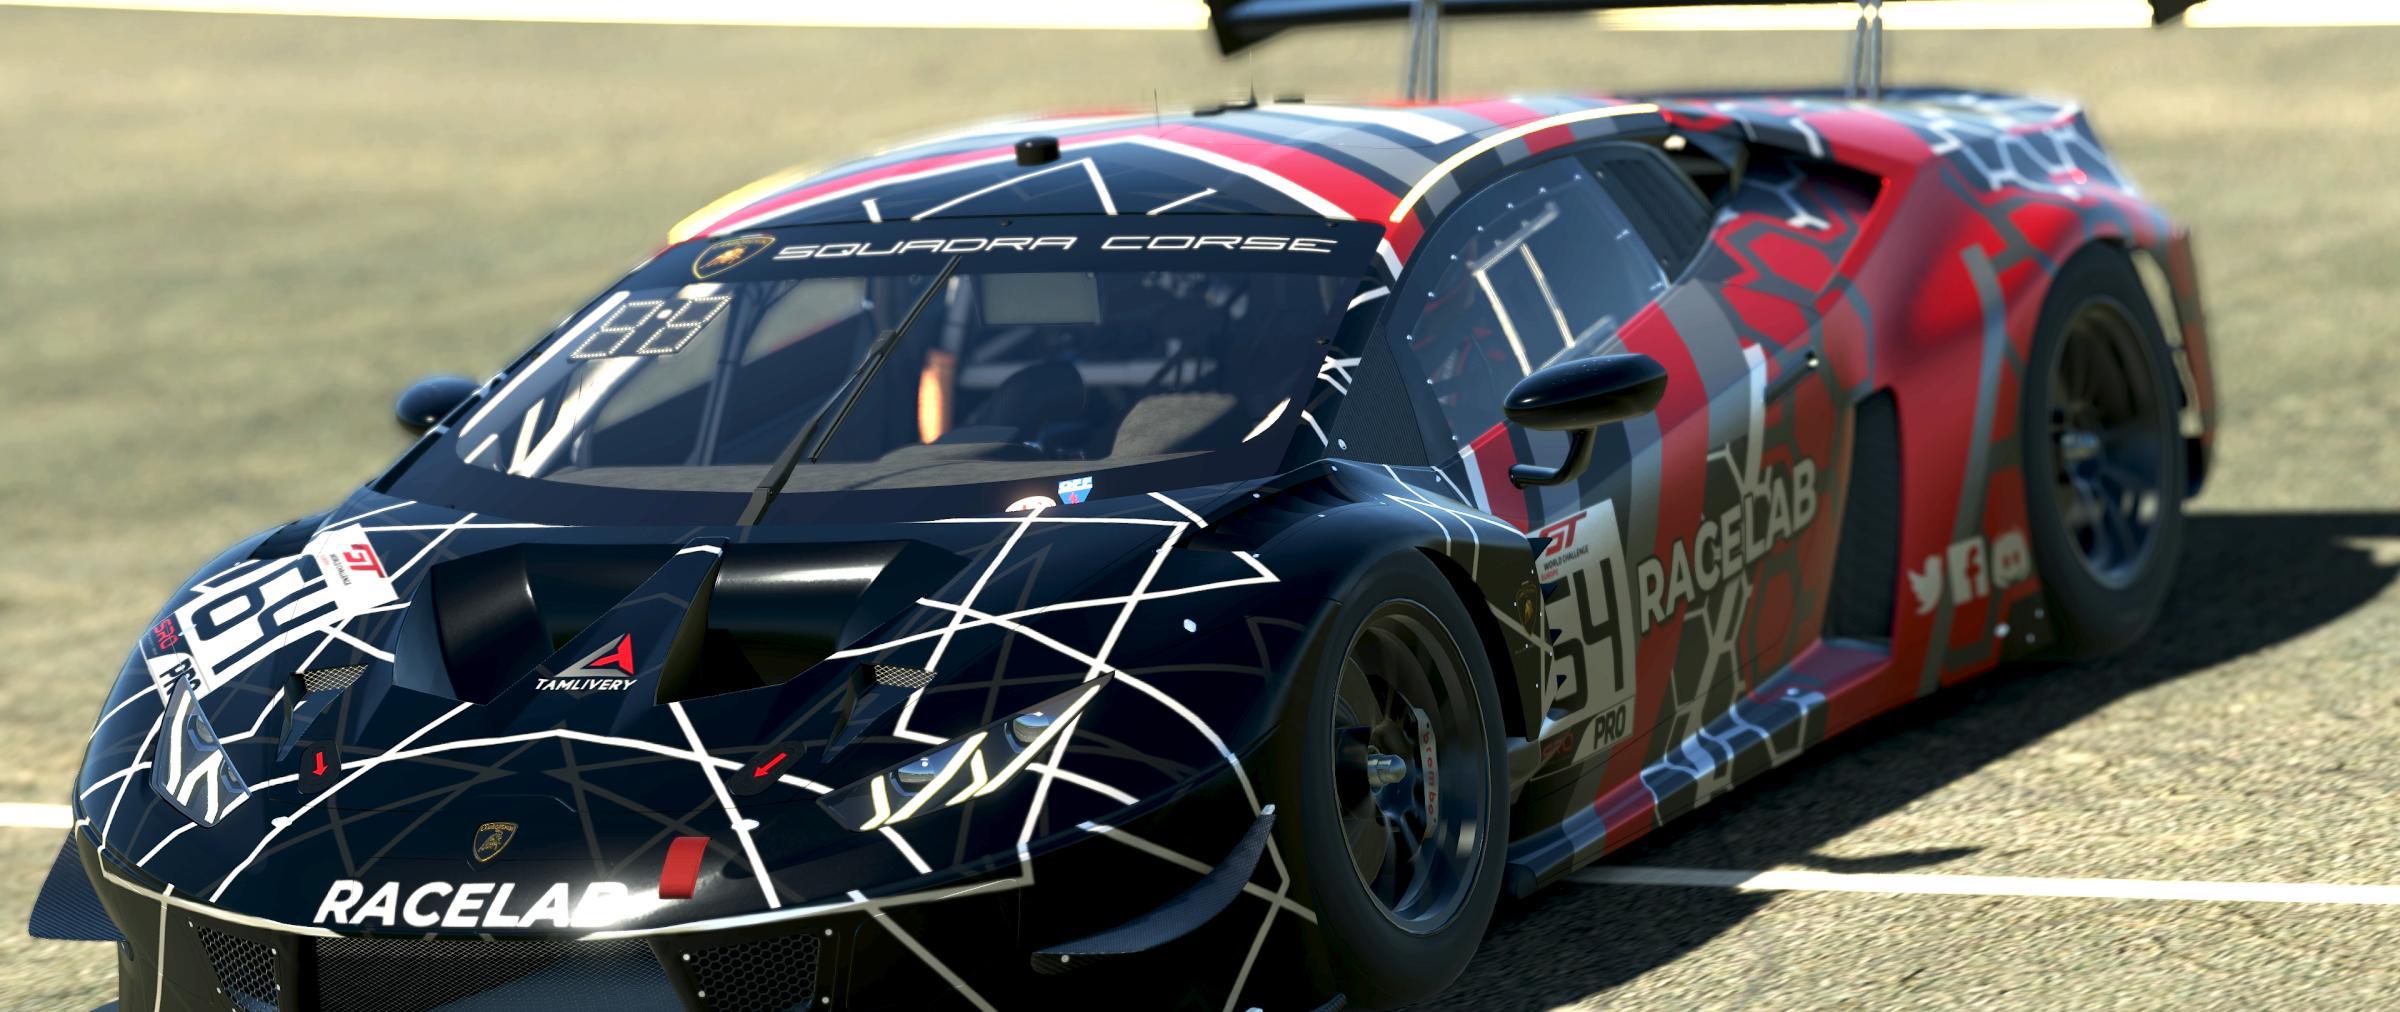 Preview of Lamborghini Huracán EVO GT3 Racelab Livery by Krisztián Kónya